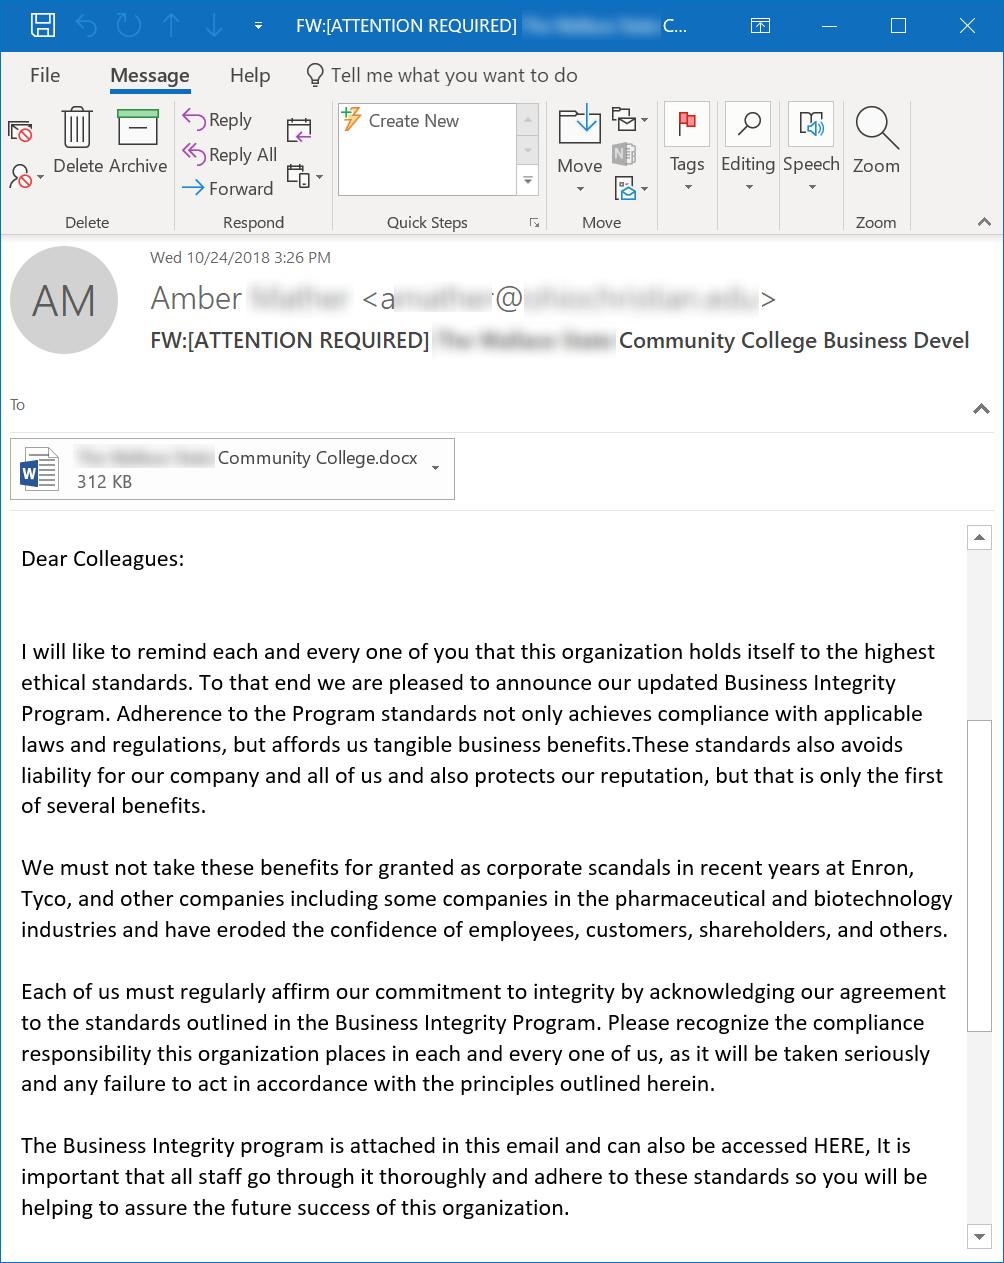 3zgecsv5  - 3zgecsv5 - Clever Phishing Emails Target Educational Organizations